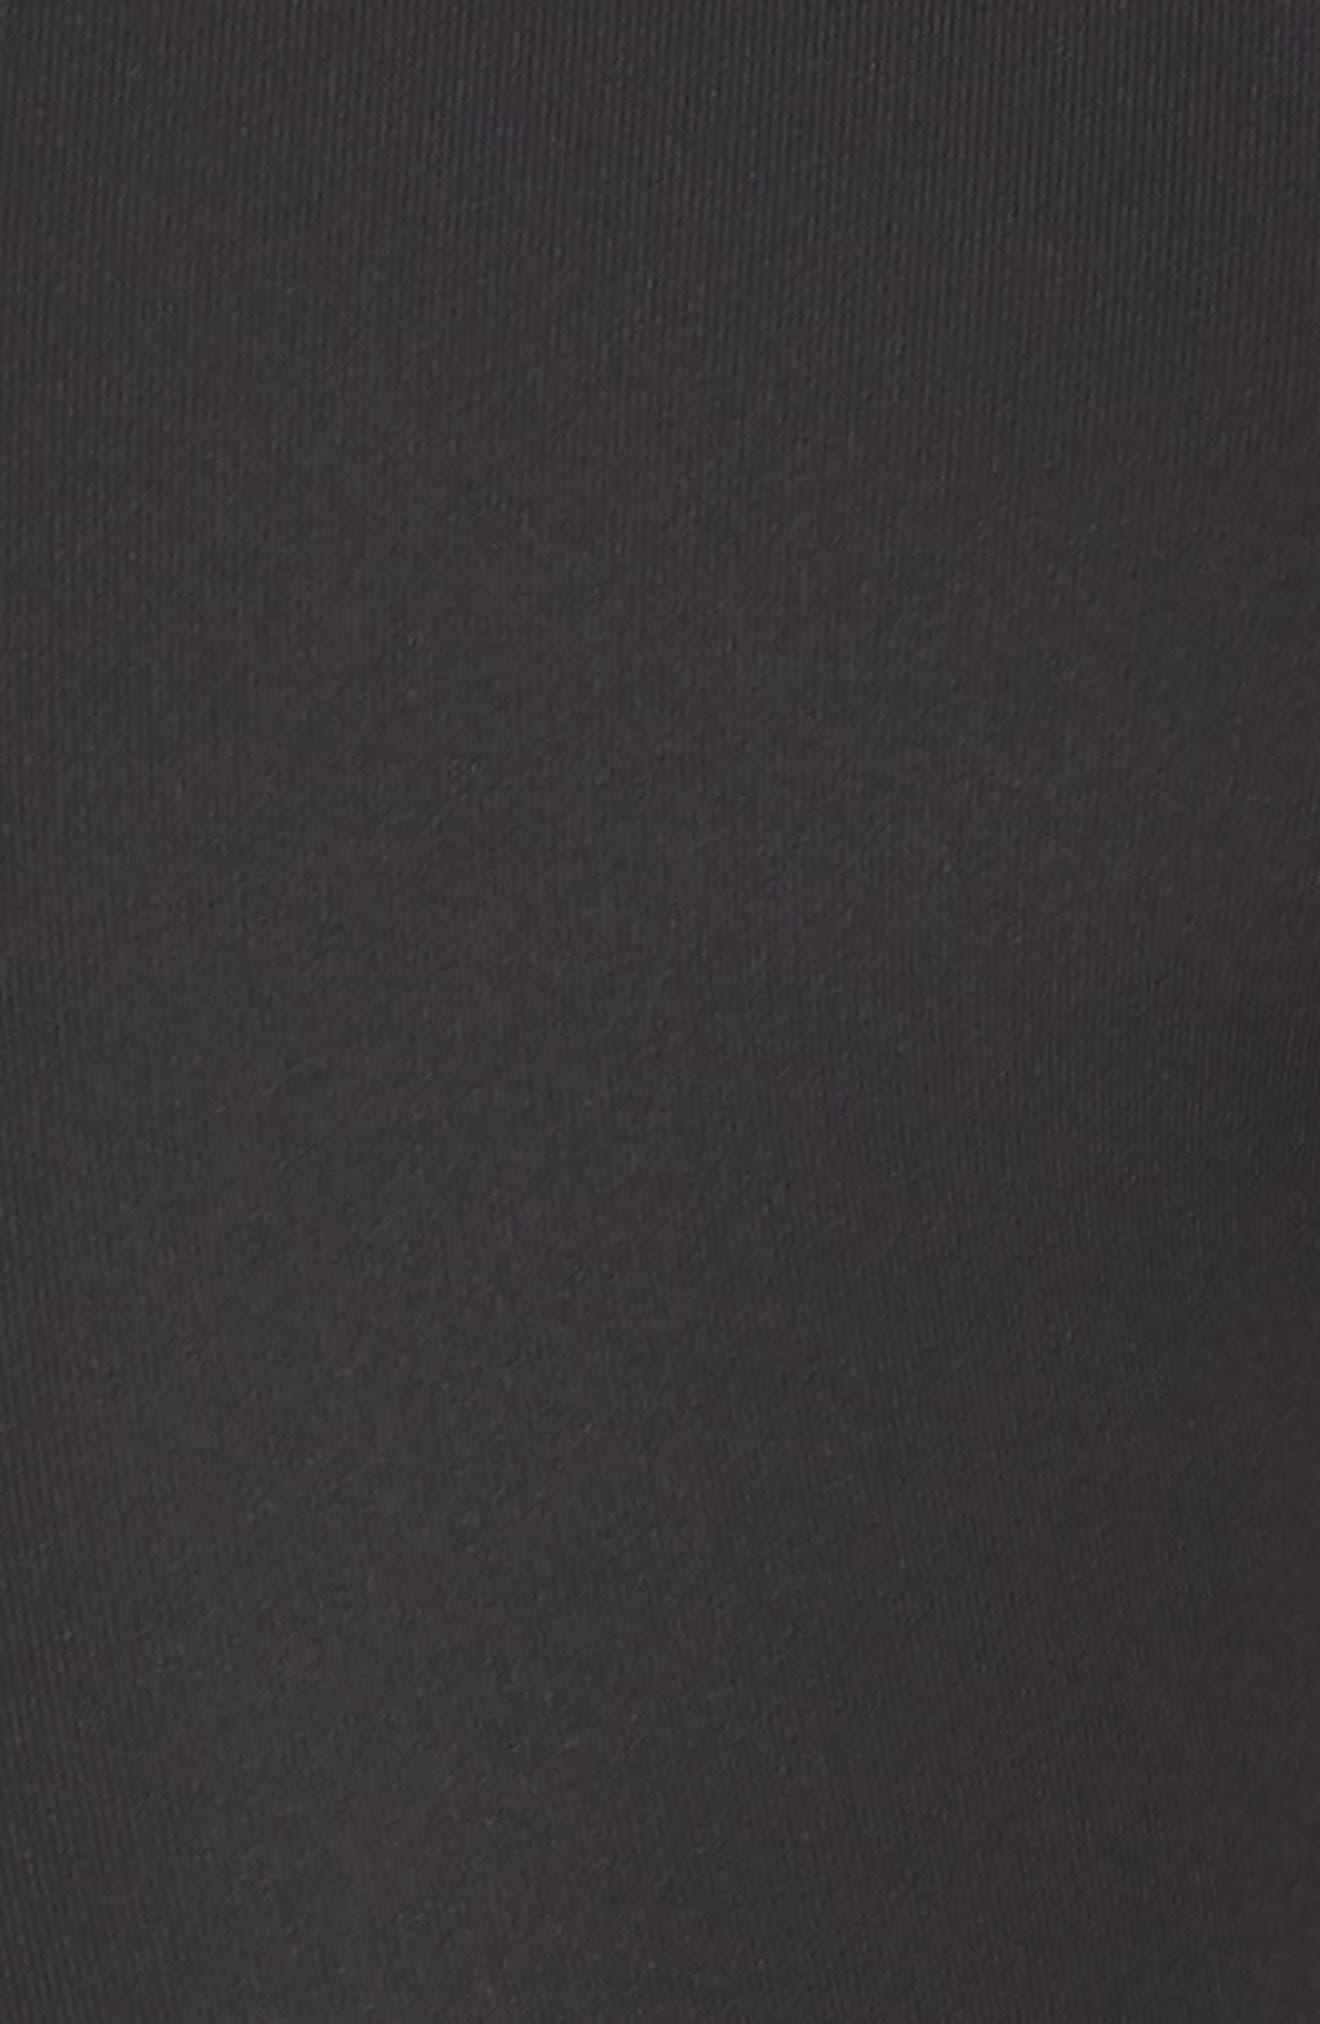 Intrigue High Waist Crop Leggings,                             Alternate thumbnail 6, color,                             BLACK